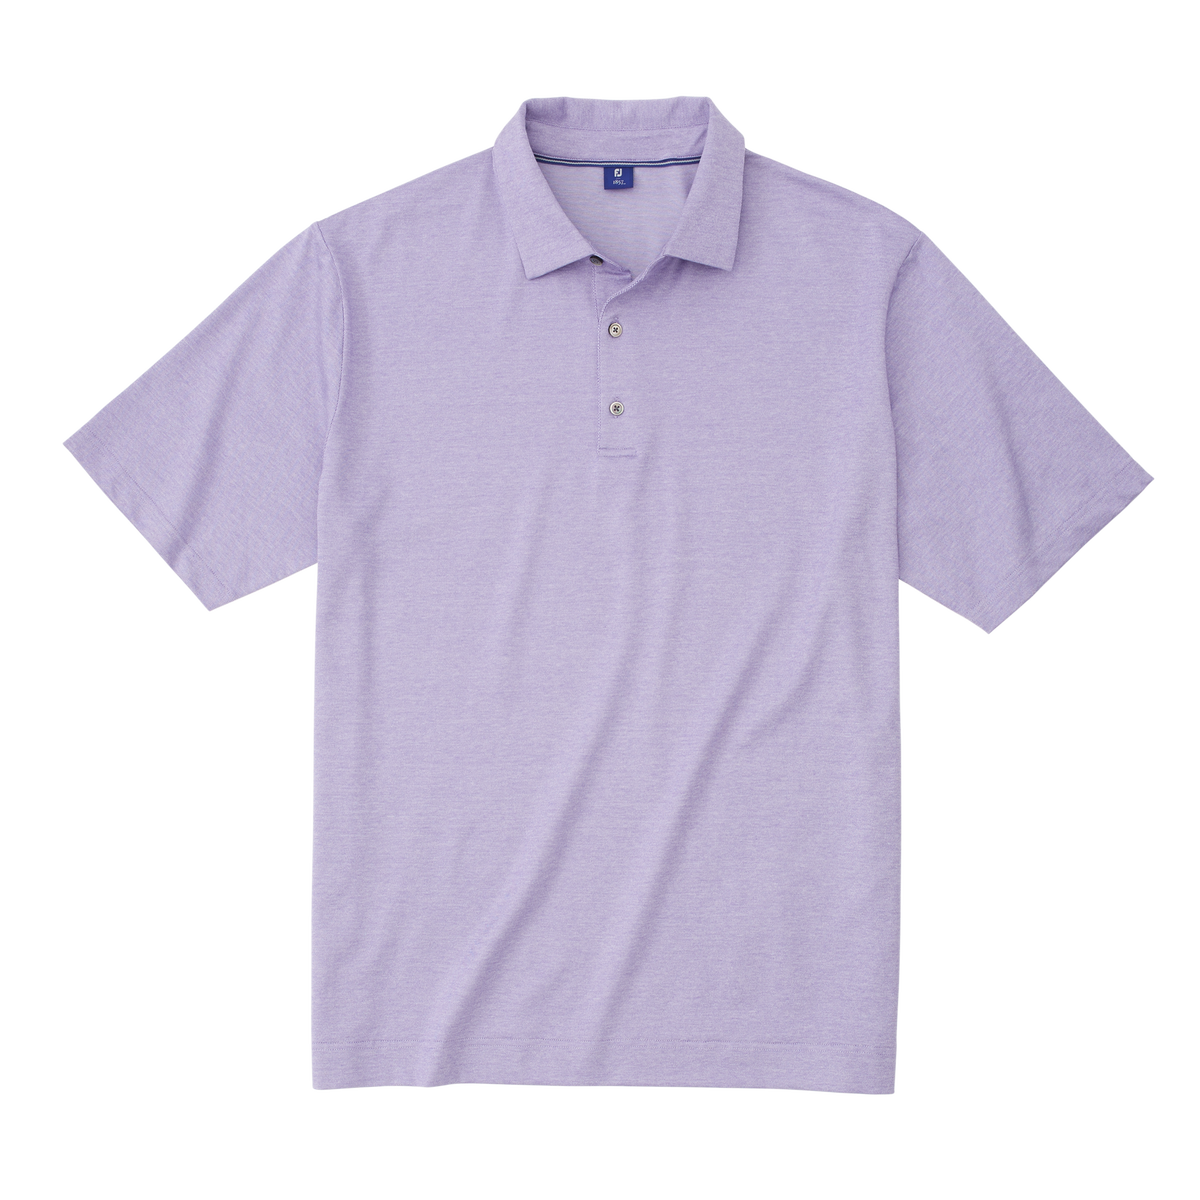 Nailhead Jacquard Knit Shirt